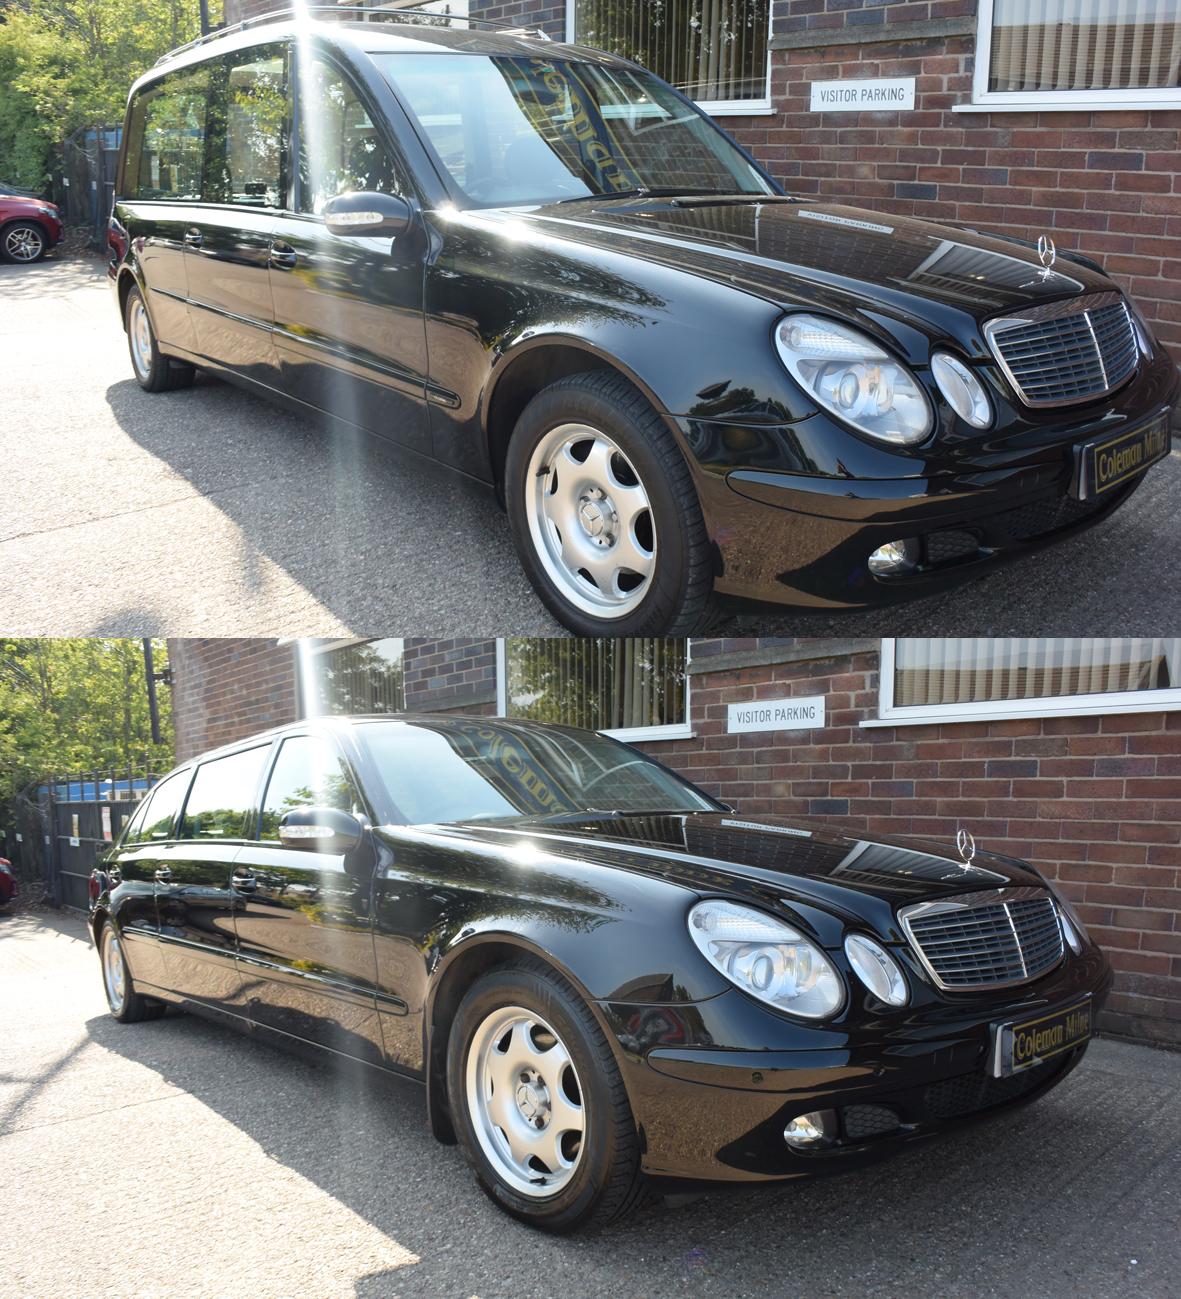 2010 Jaguar For Sale: Used Funeral Cars For Sale